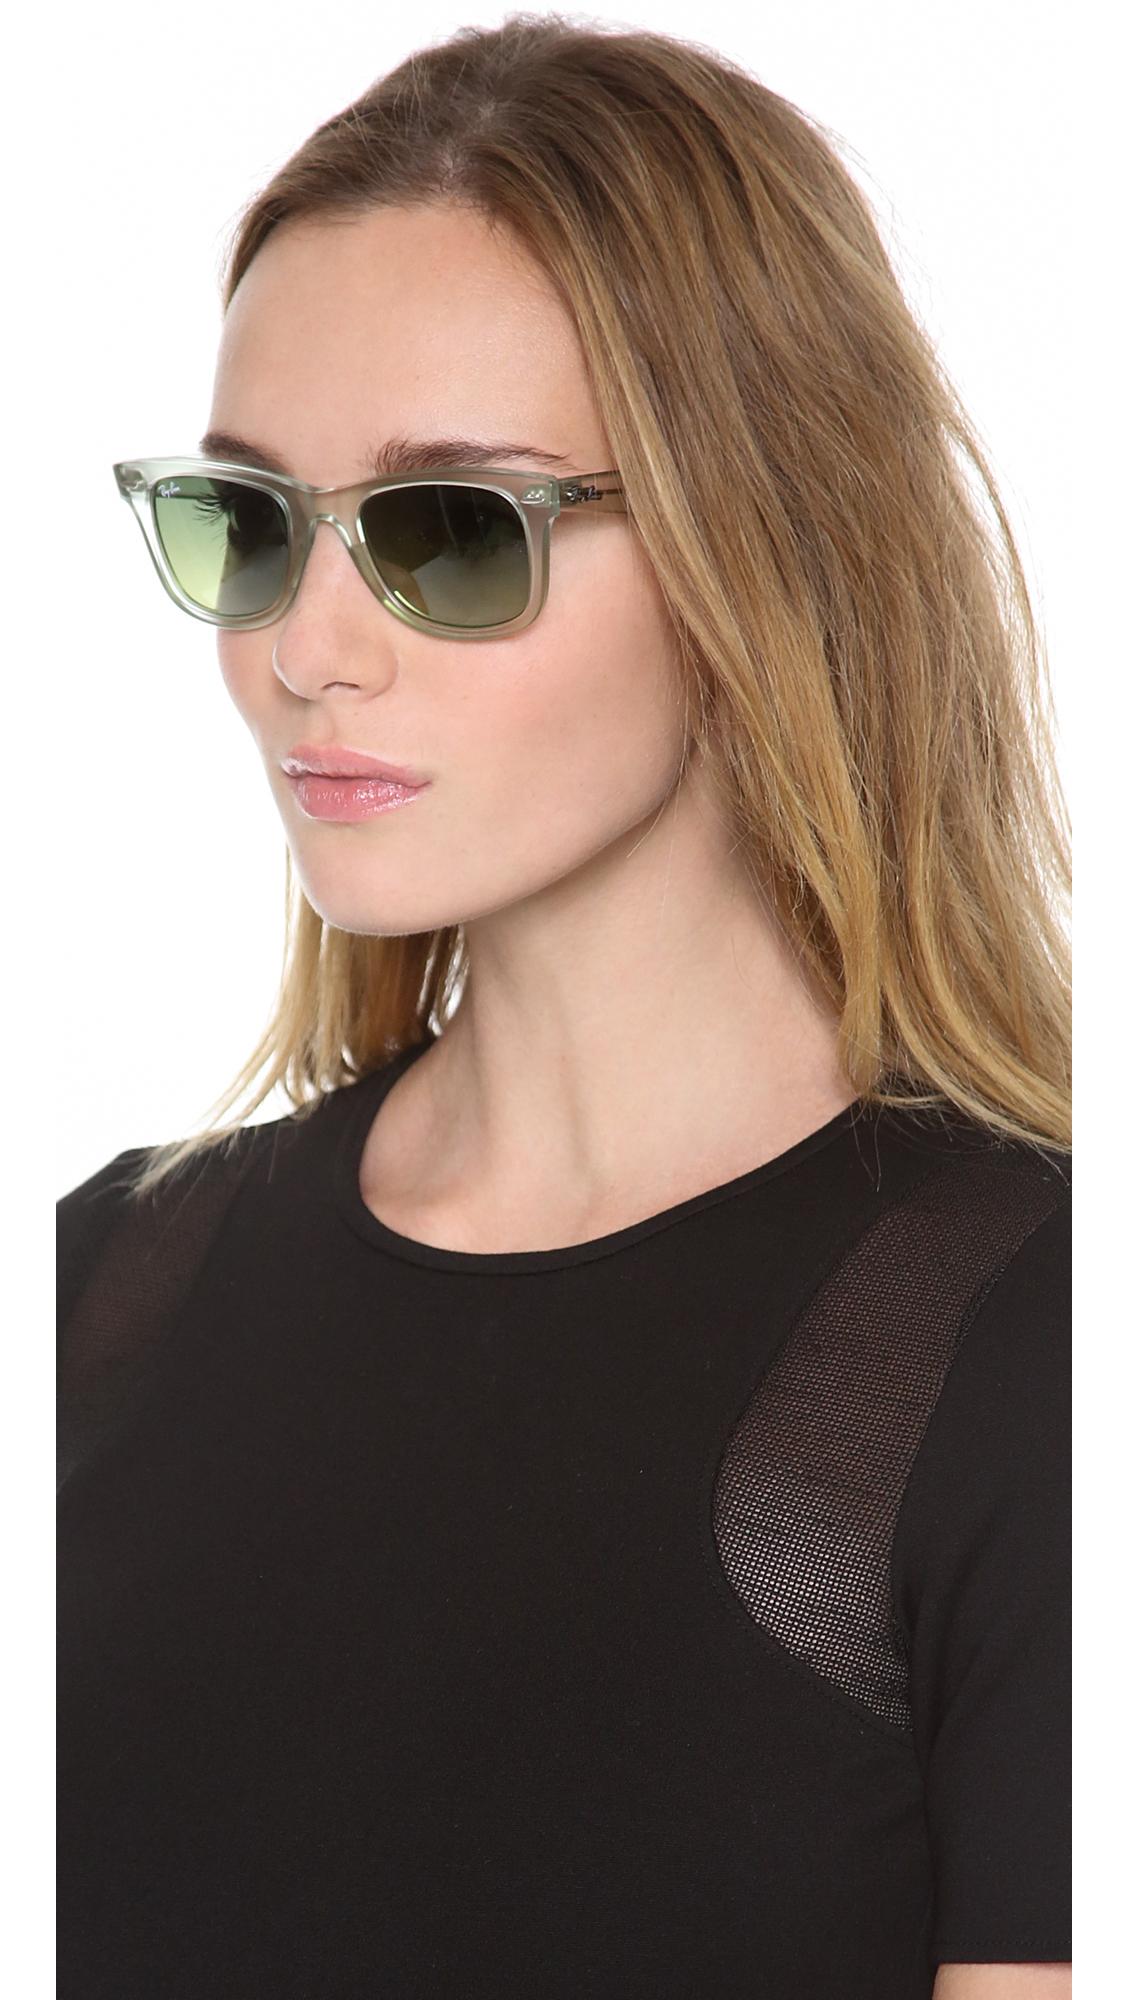 715a98f9d1 Ray-Ban Ice Pop Wayfarer Sunglasses in Green - Lyst